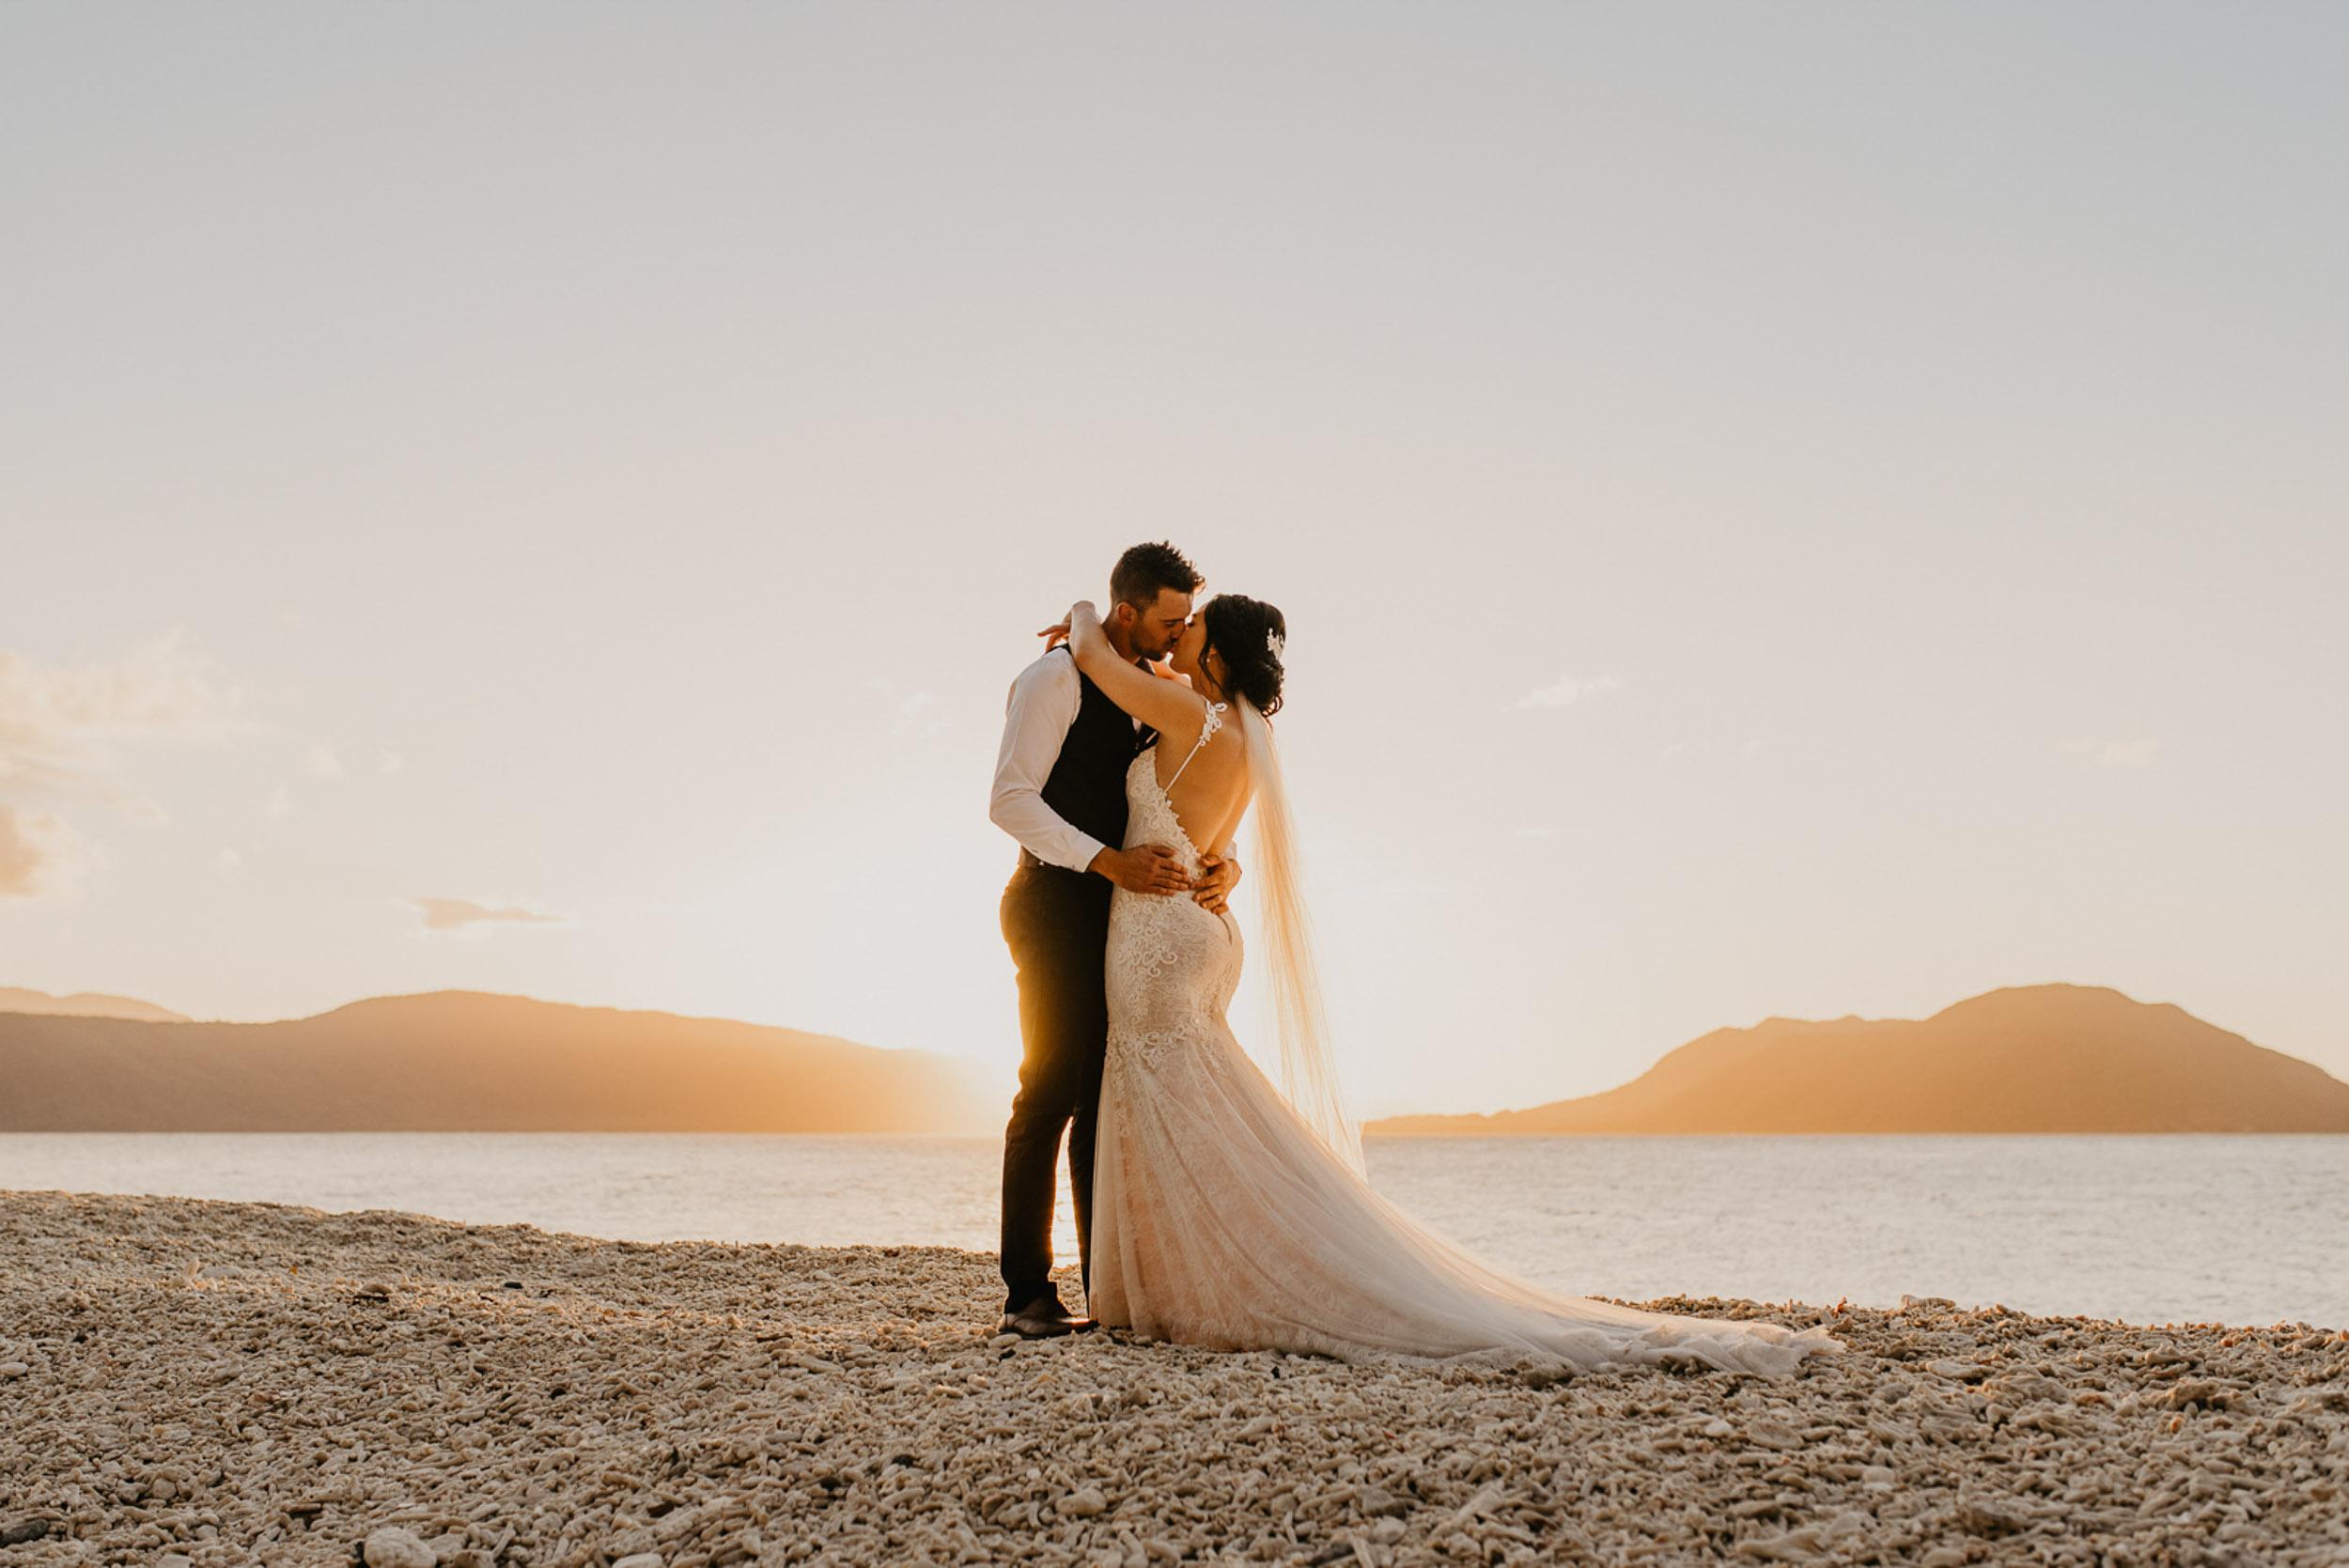 The Raw Photographer - Cairns Wedding Photographer - Fitzroy Island - Destination Wedding - Bride Dress - Groom Portrait - Queensland-37.jpg